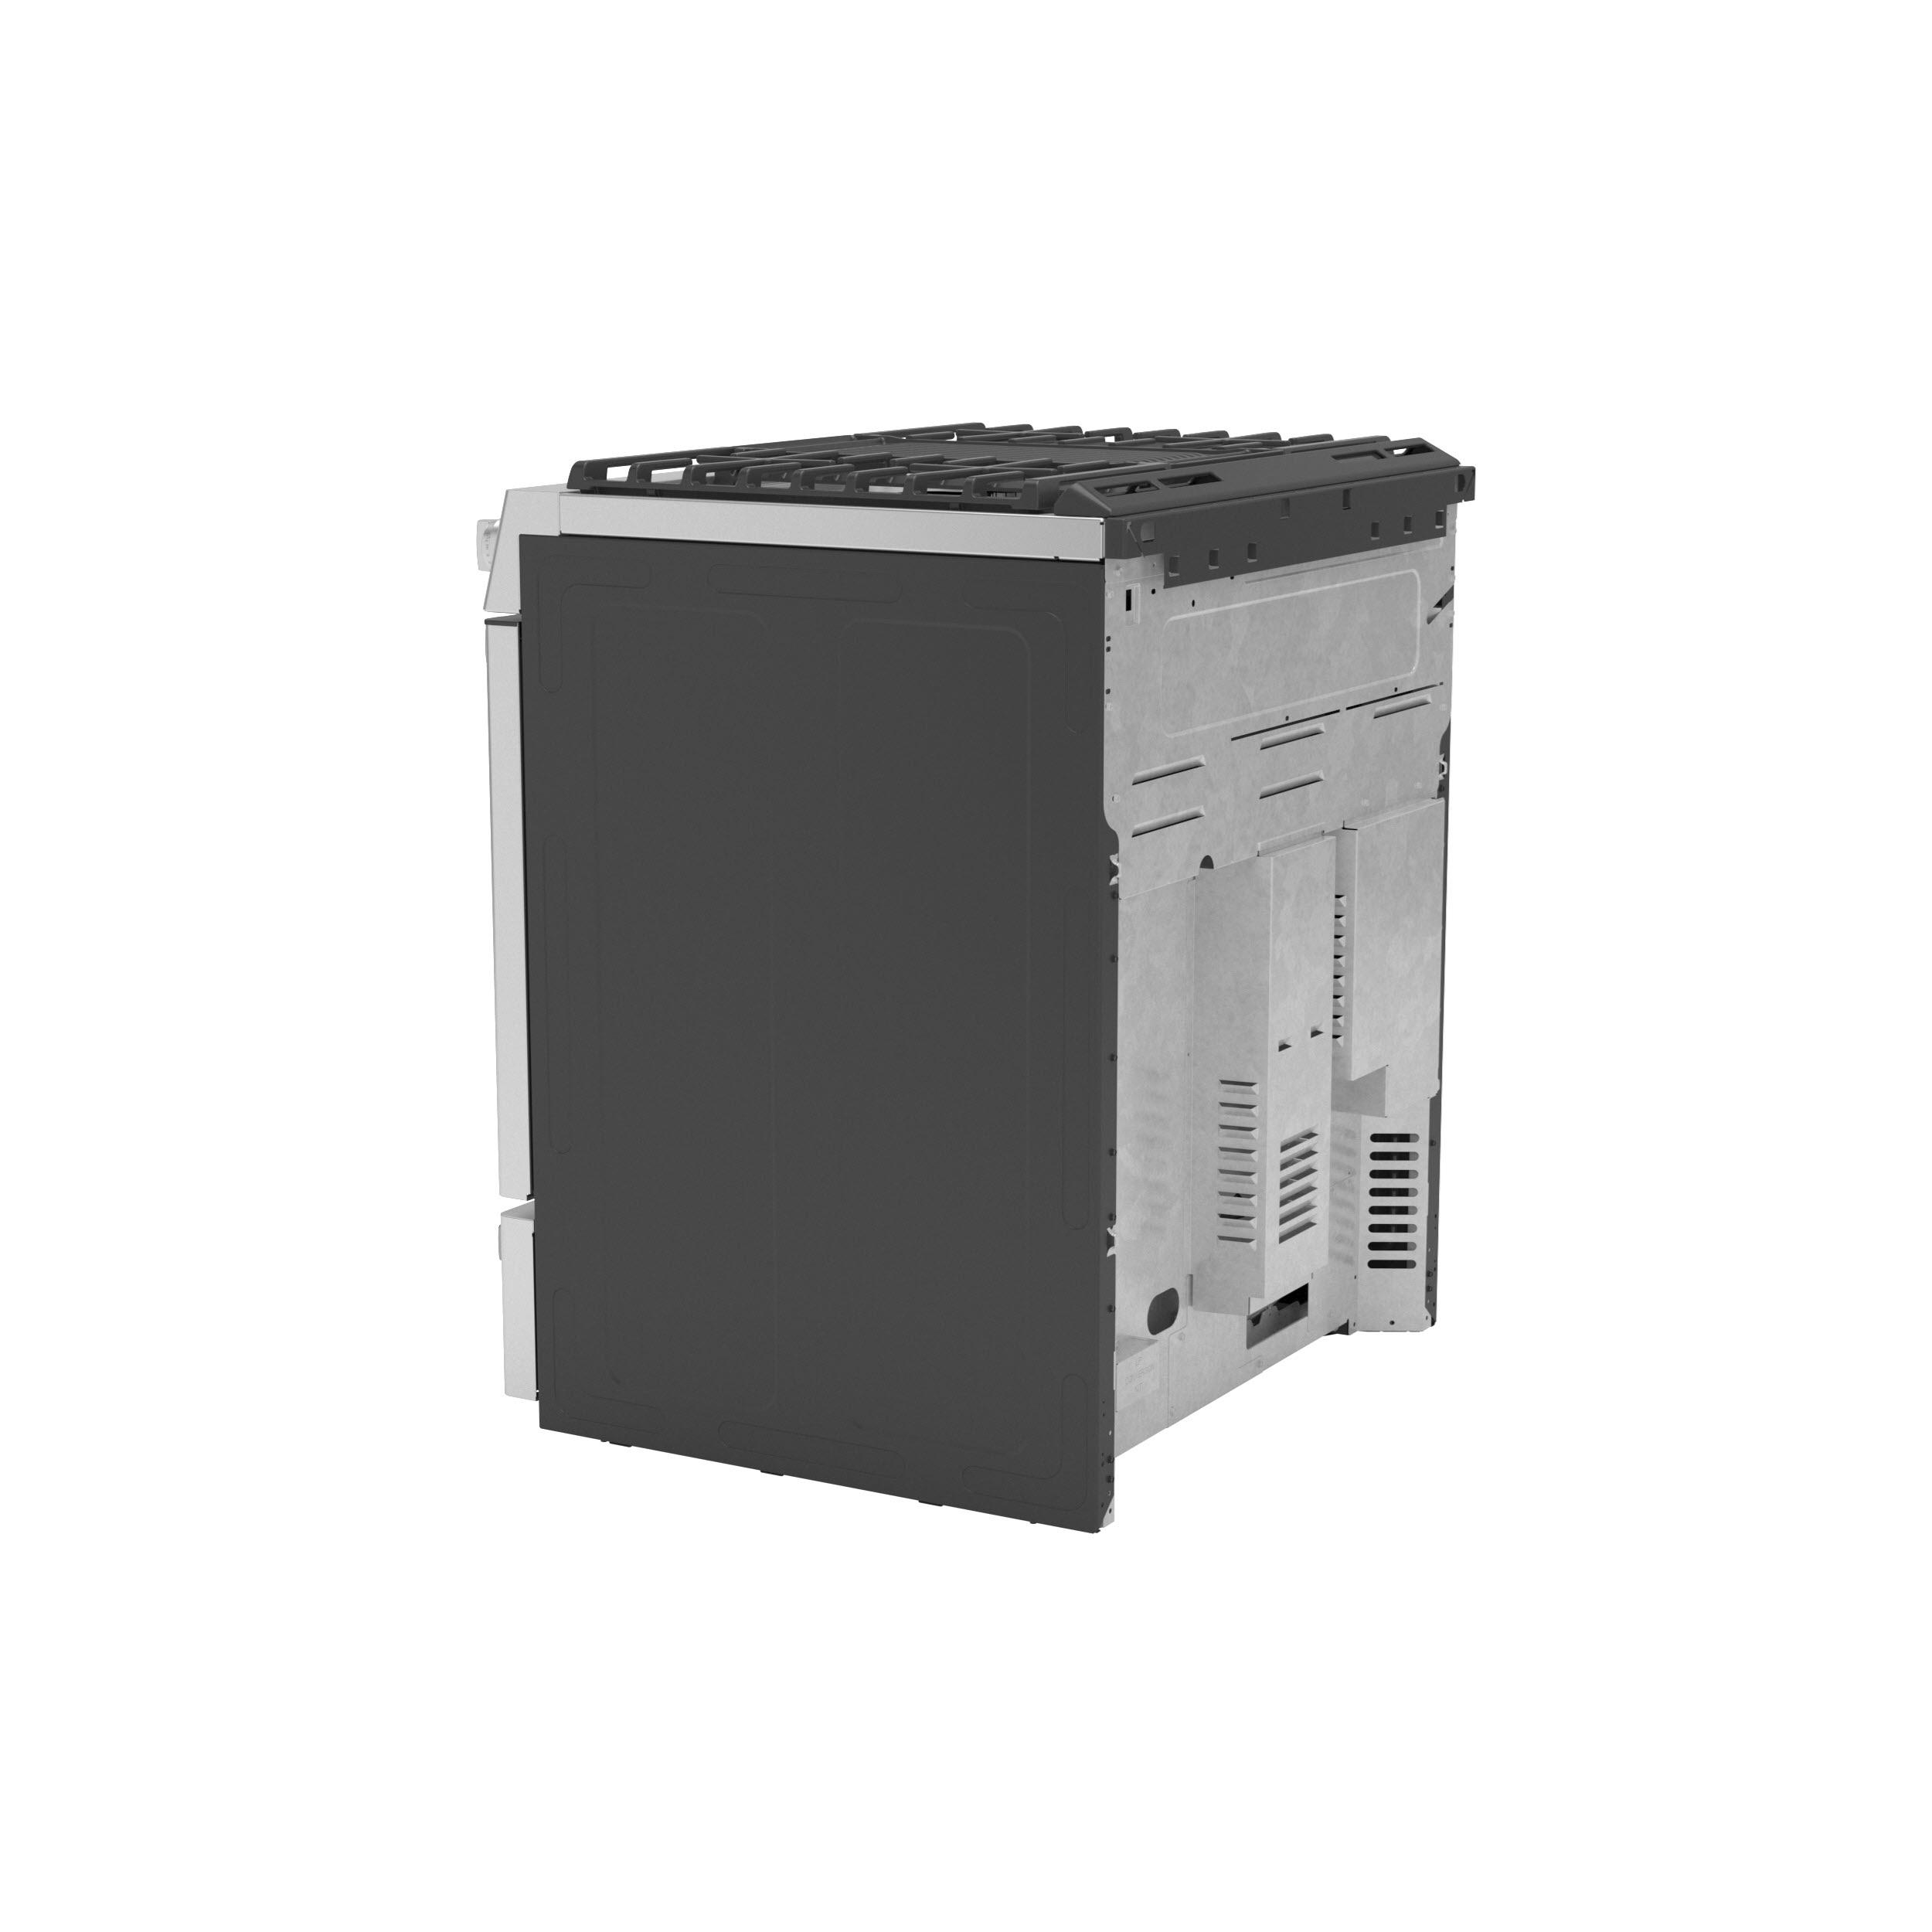 "Model: P2S930YPFS | GE Profile GE Profile™ 30"" Smart Dual Fuel Slide-In Front-Control Fingerprint Resistant Range"